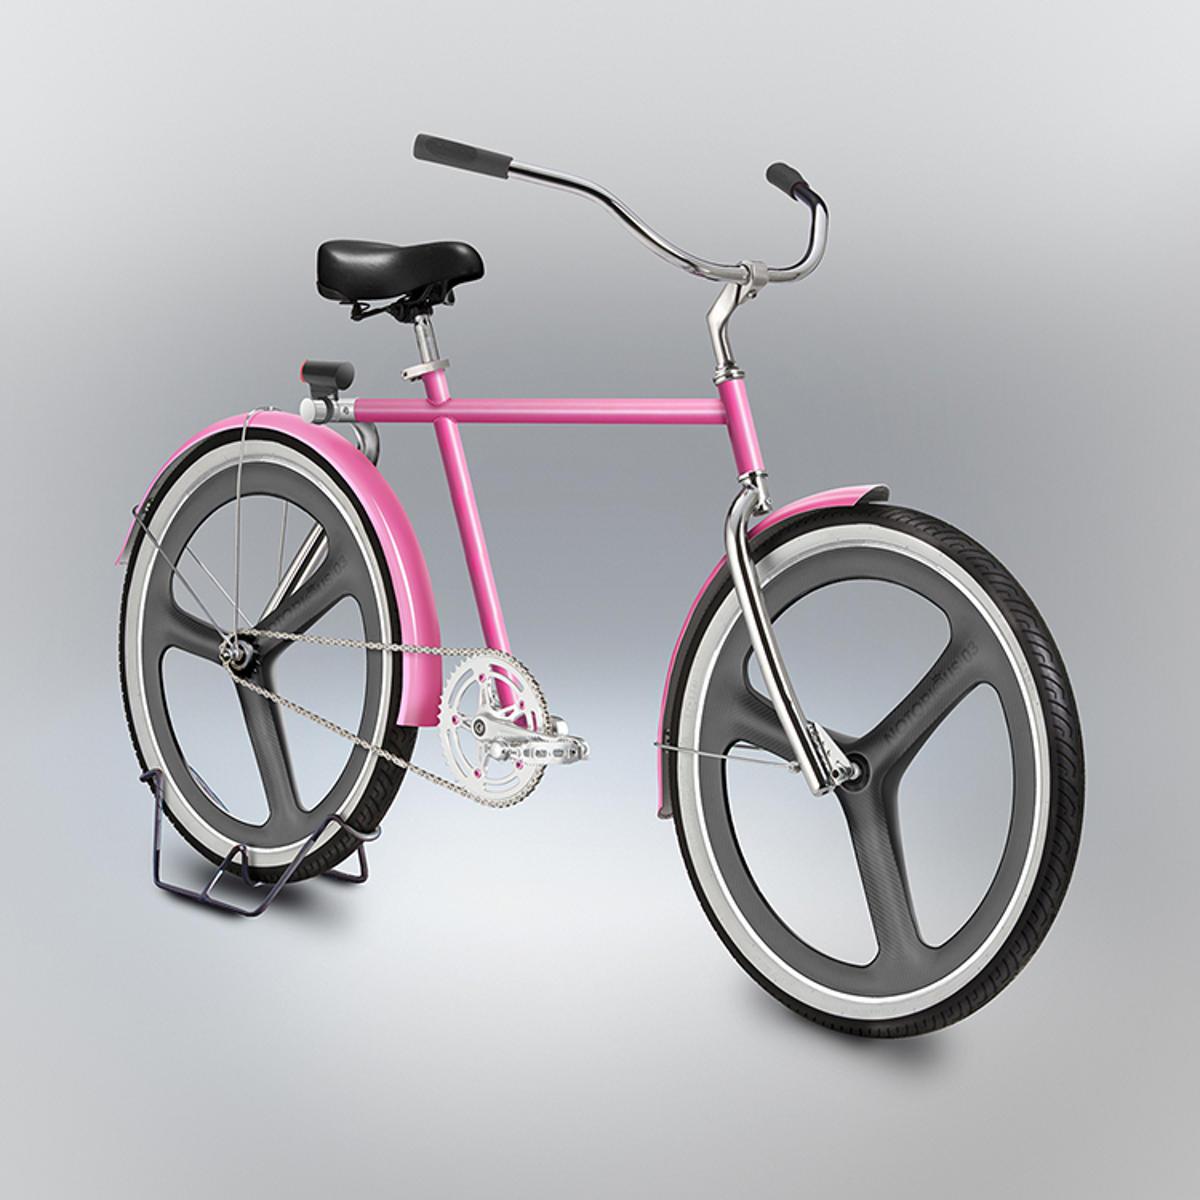 bike desings from memory italian futuristic (10)